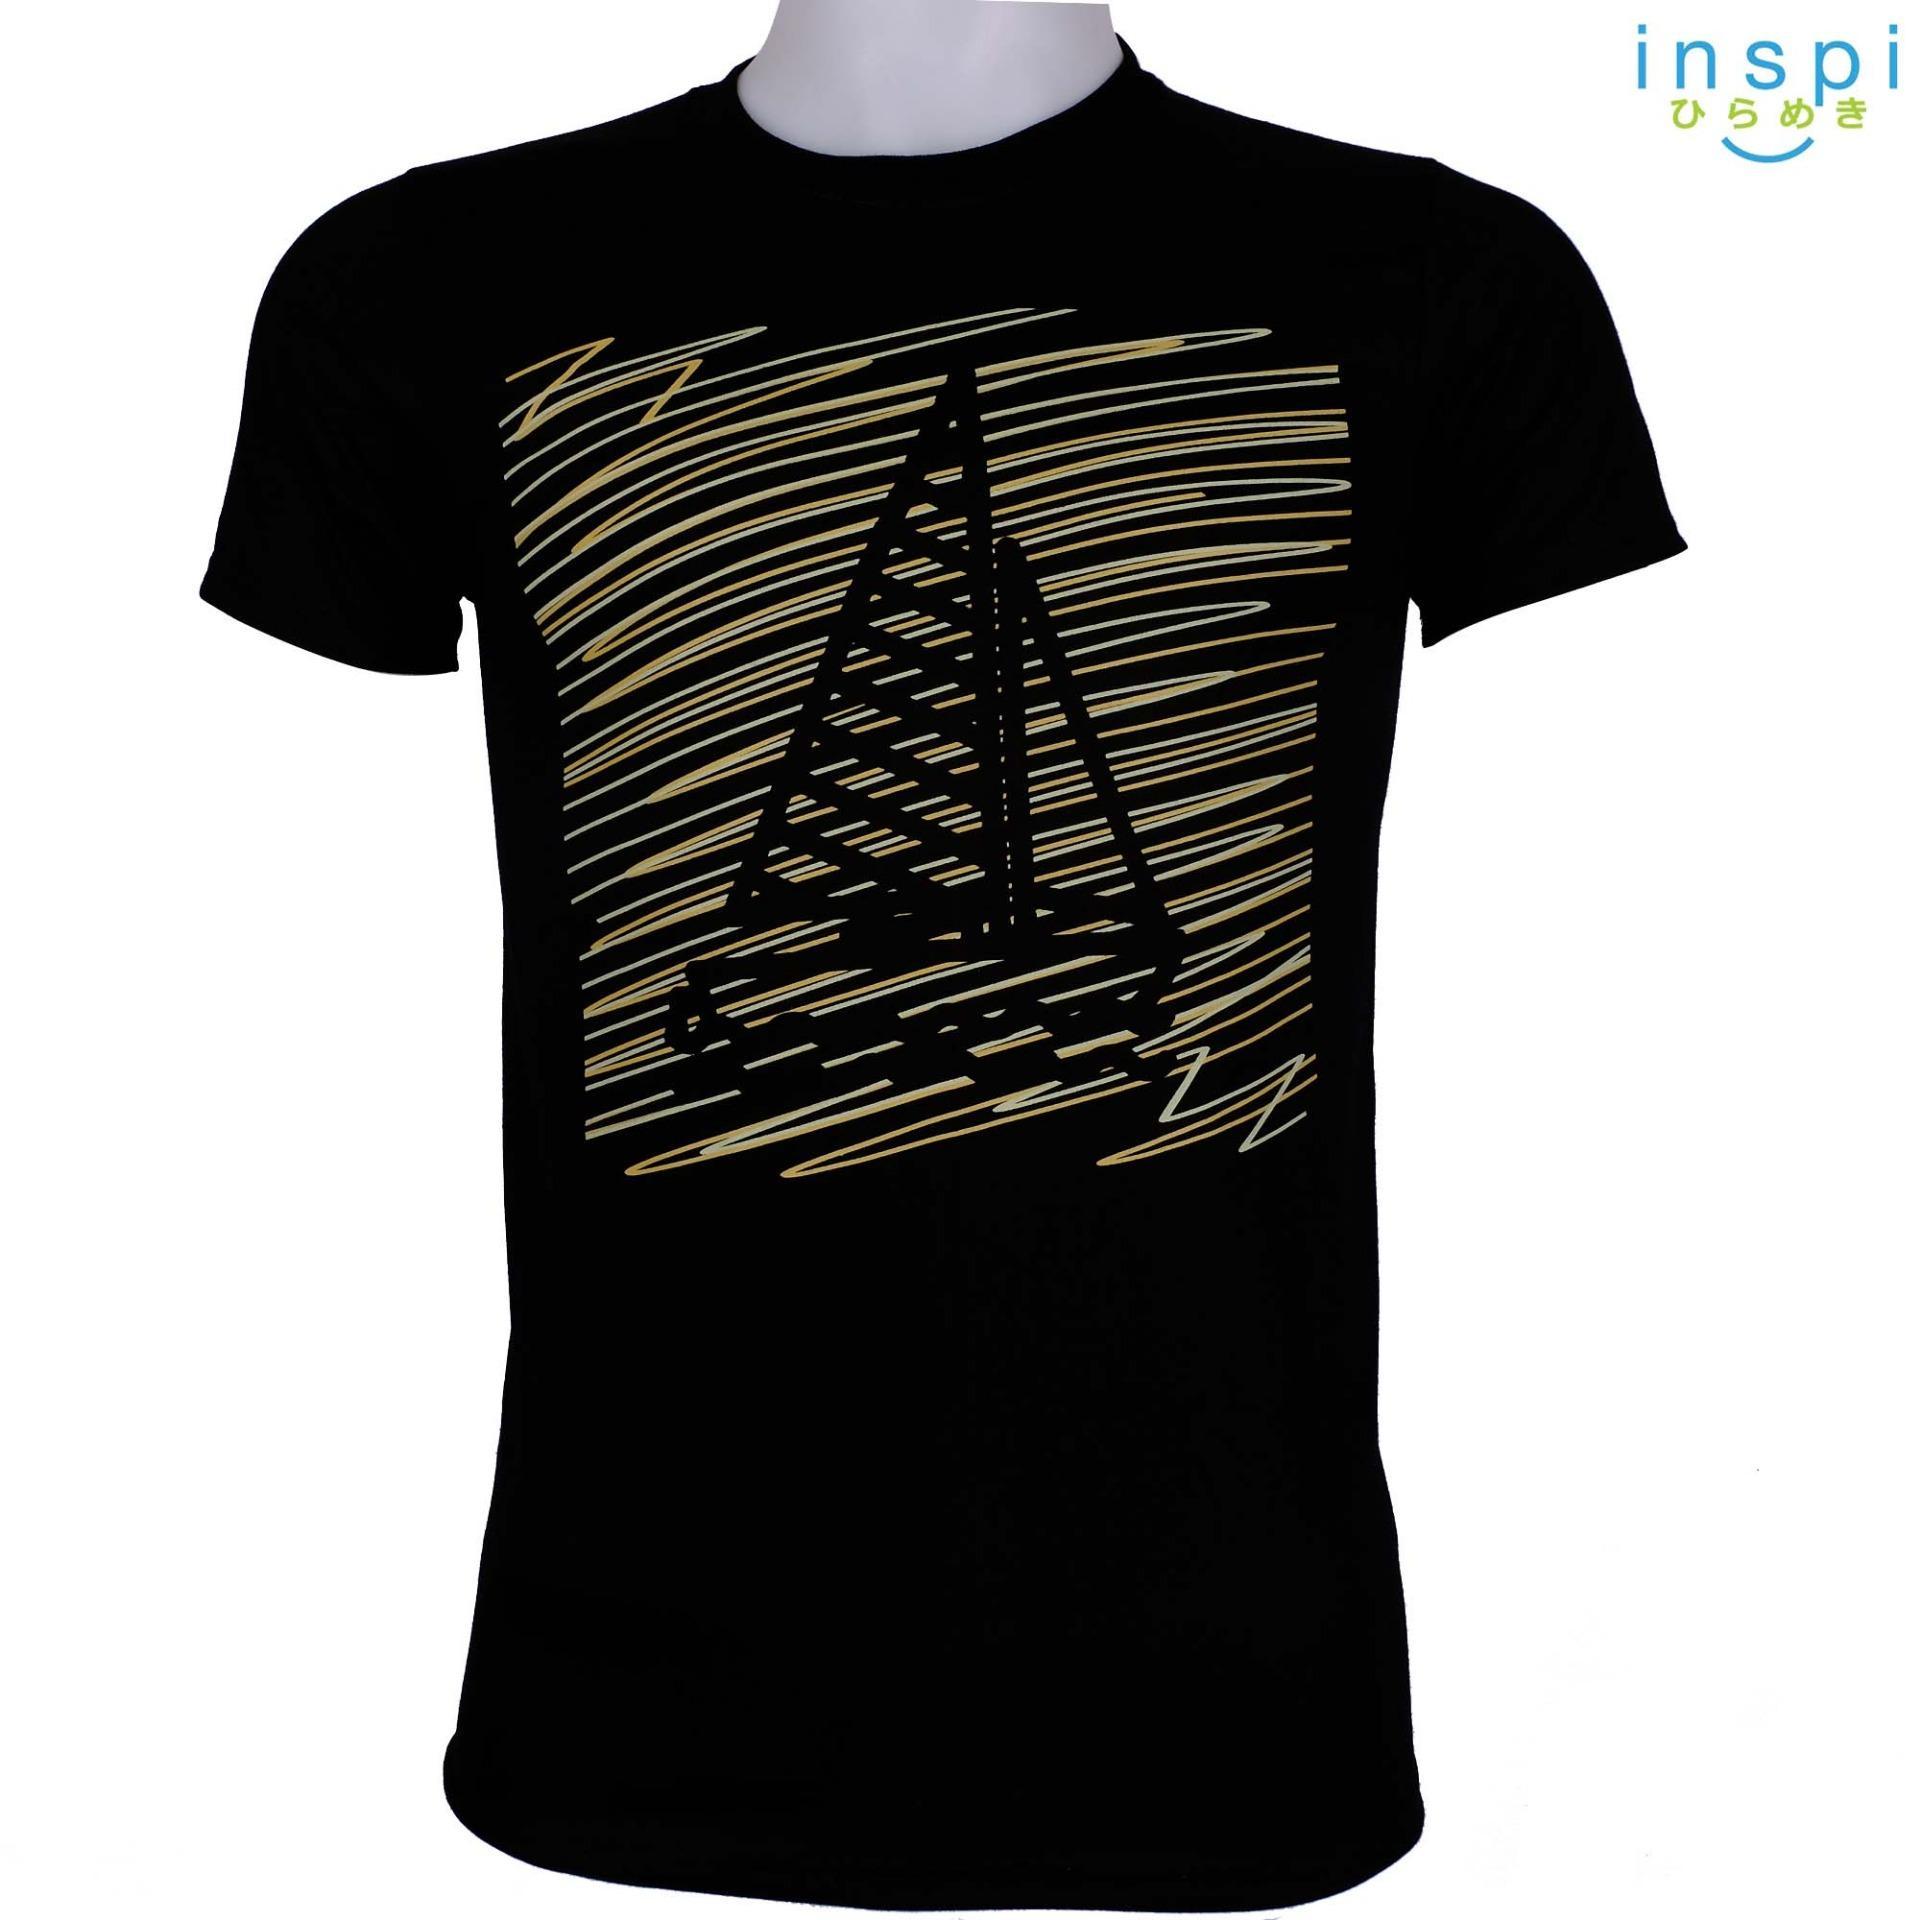 INSPI Tees Doodle Boat (Black) tshirt printed graphic tee Mens t shirt  shirts men